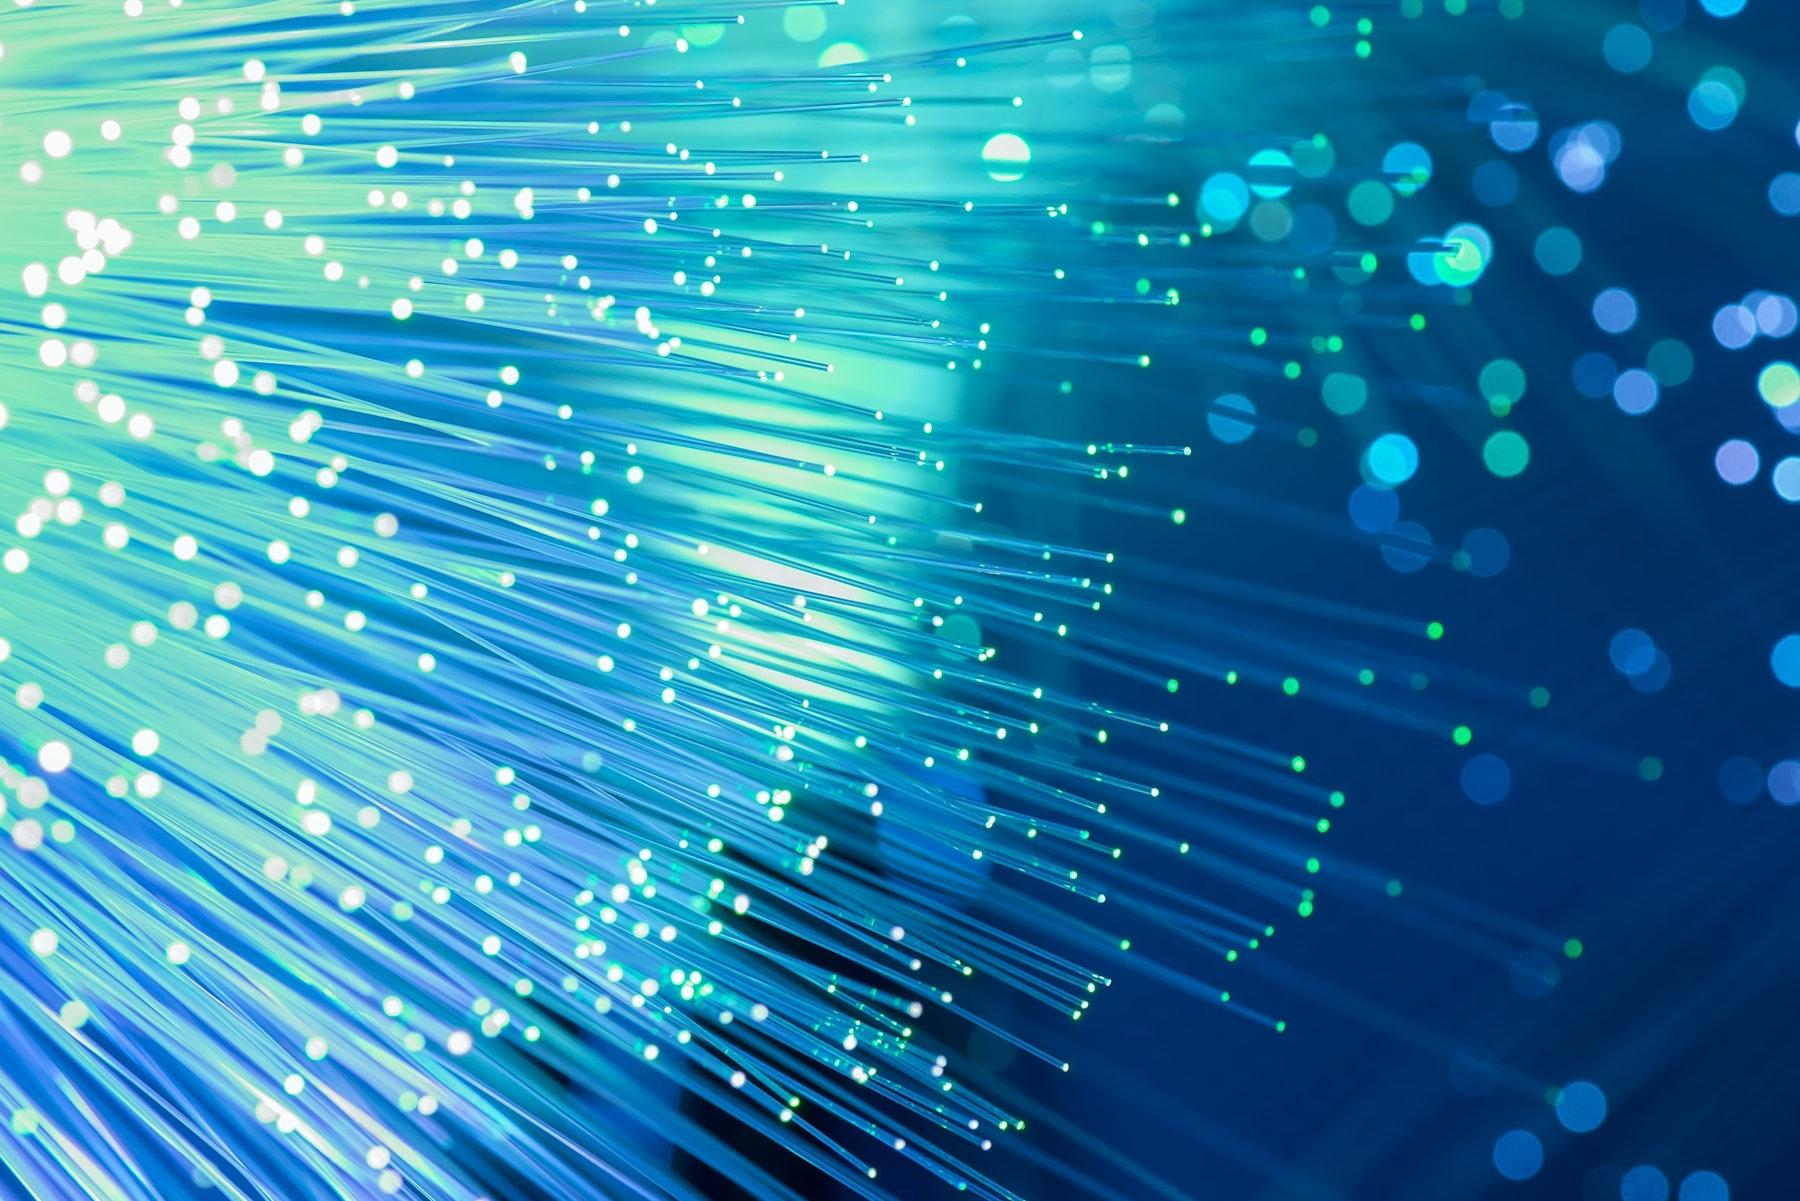 Abstract technology, fiber optic